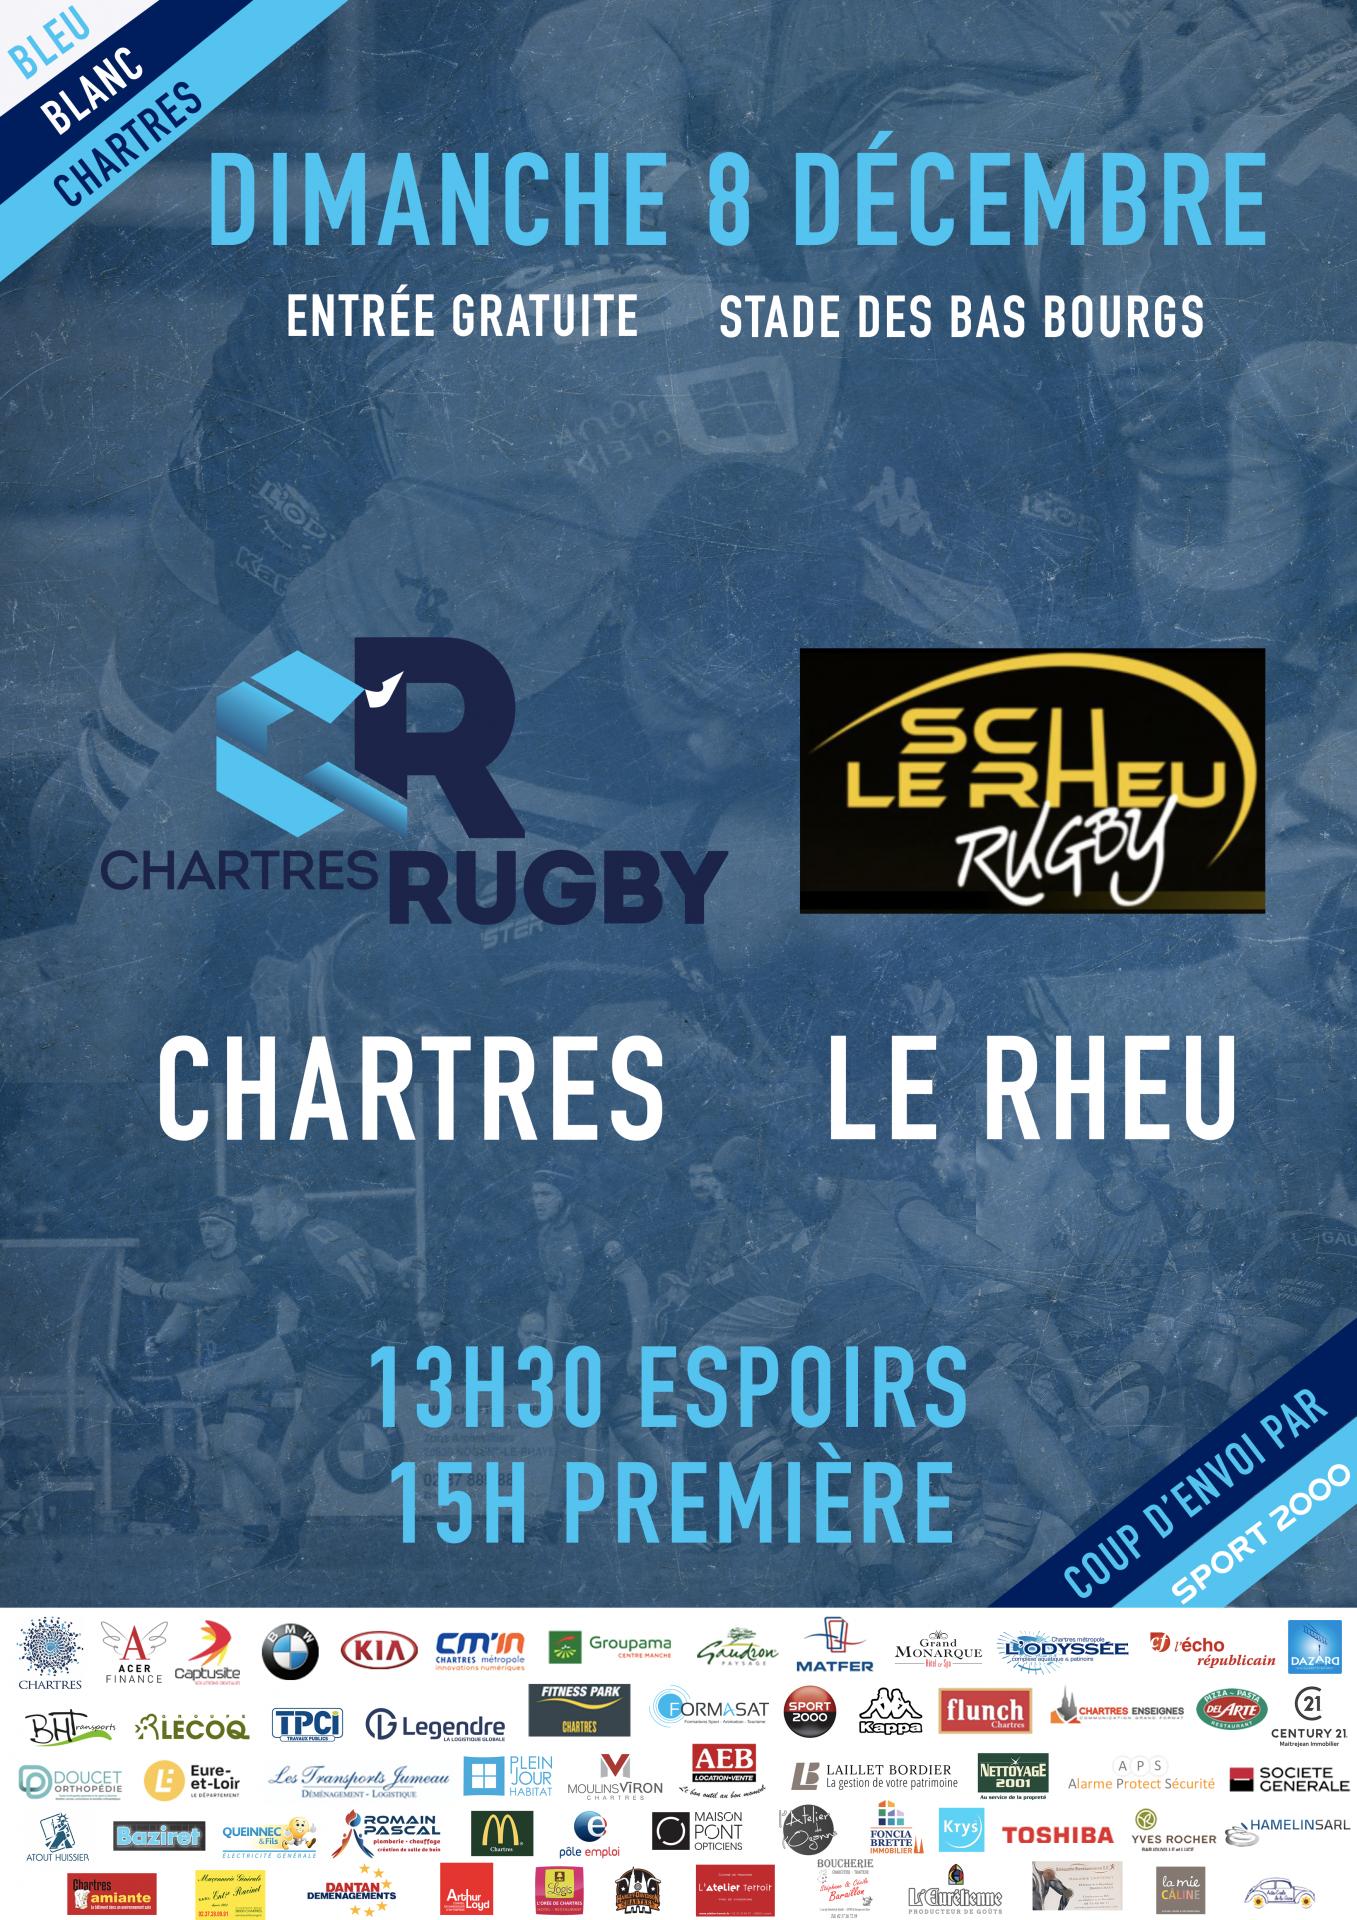 C'Chartres Rugby vs Le Rheu